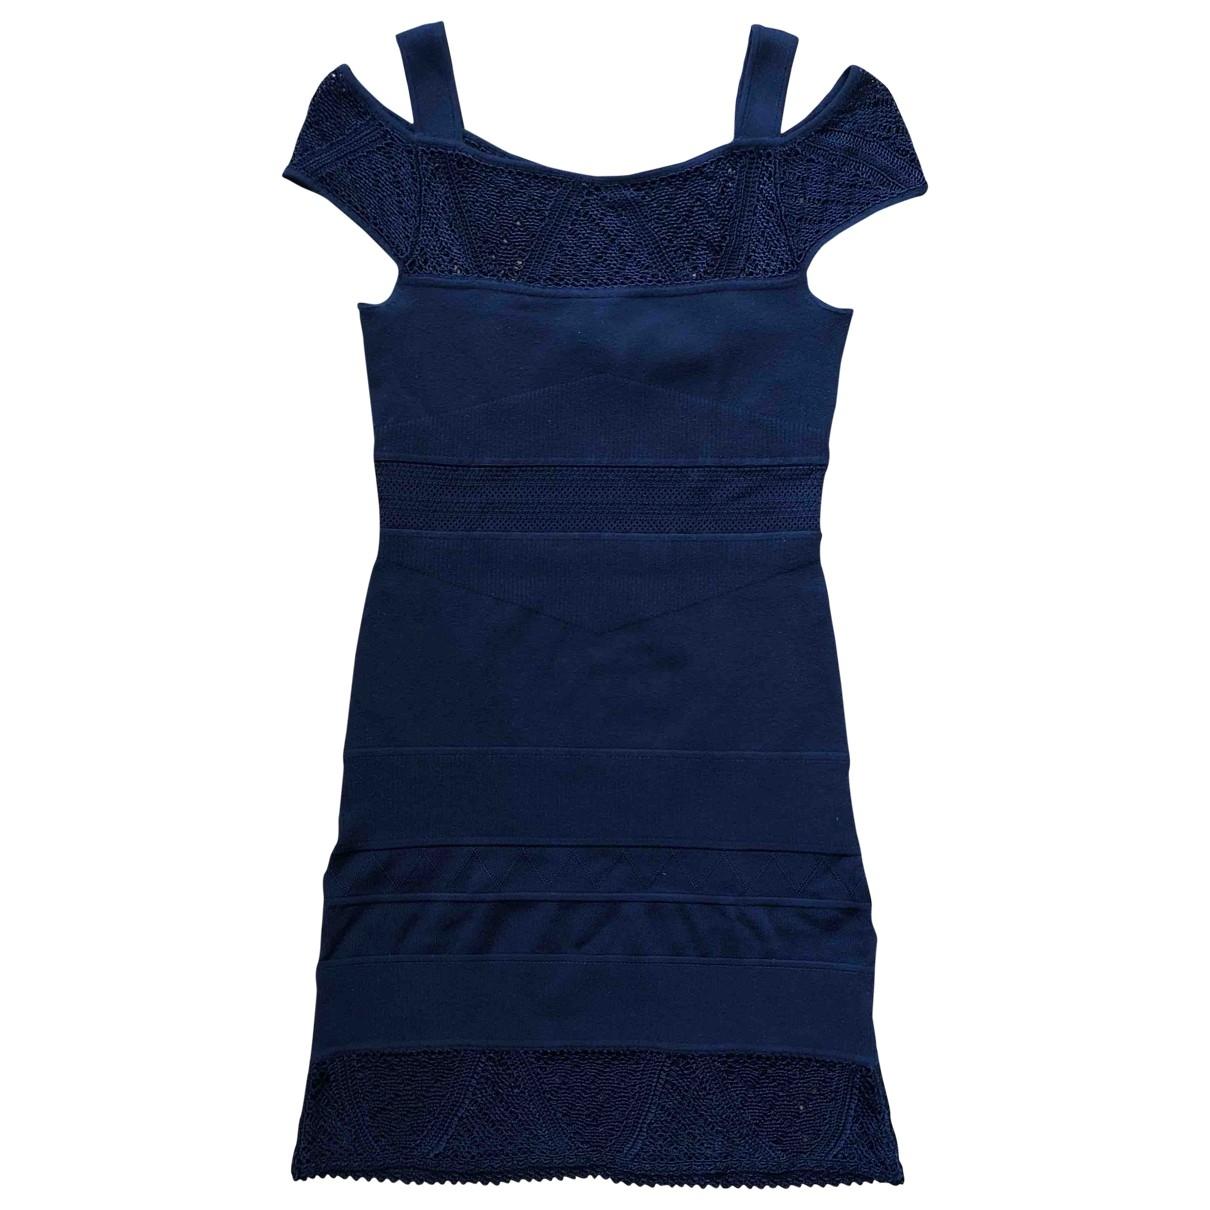 Karen Millen \N Black dress for Women 1 0-5